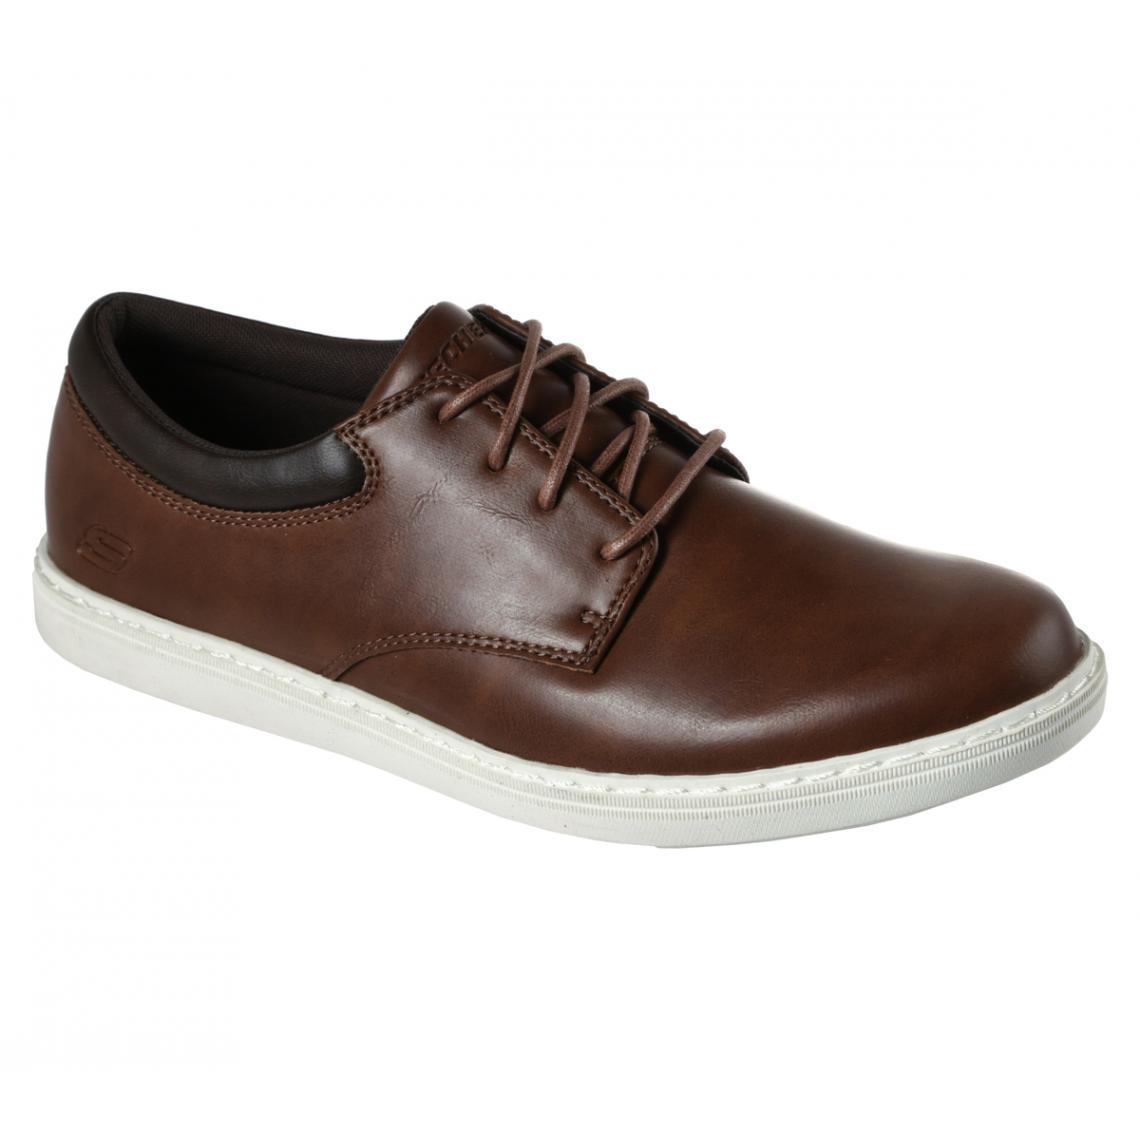 Promo : Chaussures Basses Marron - Skechers - Modalova